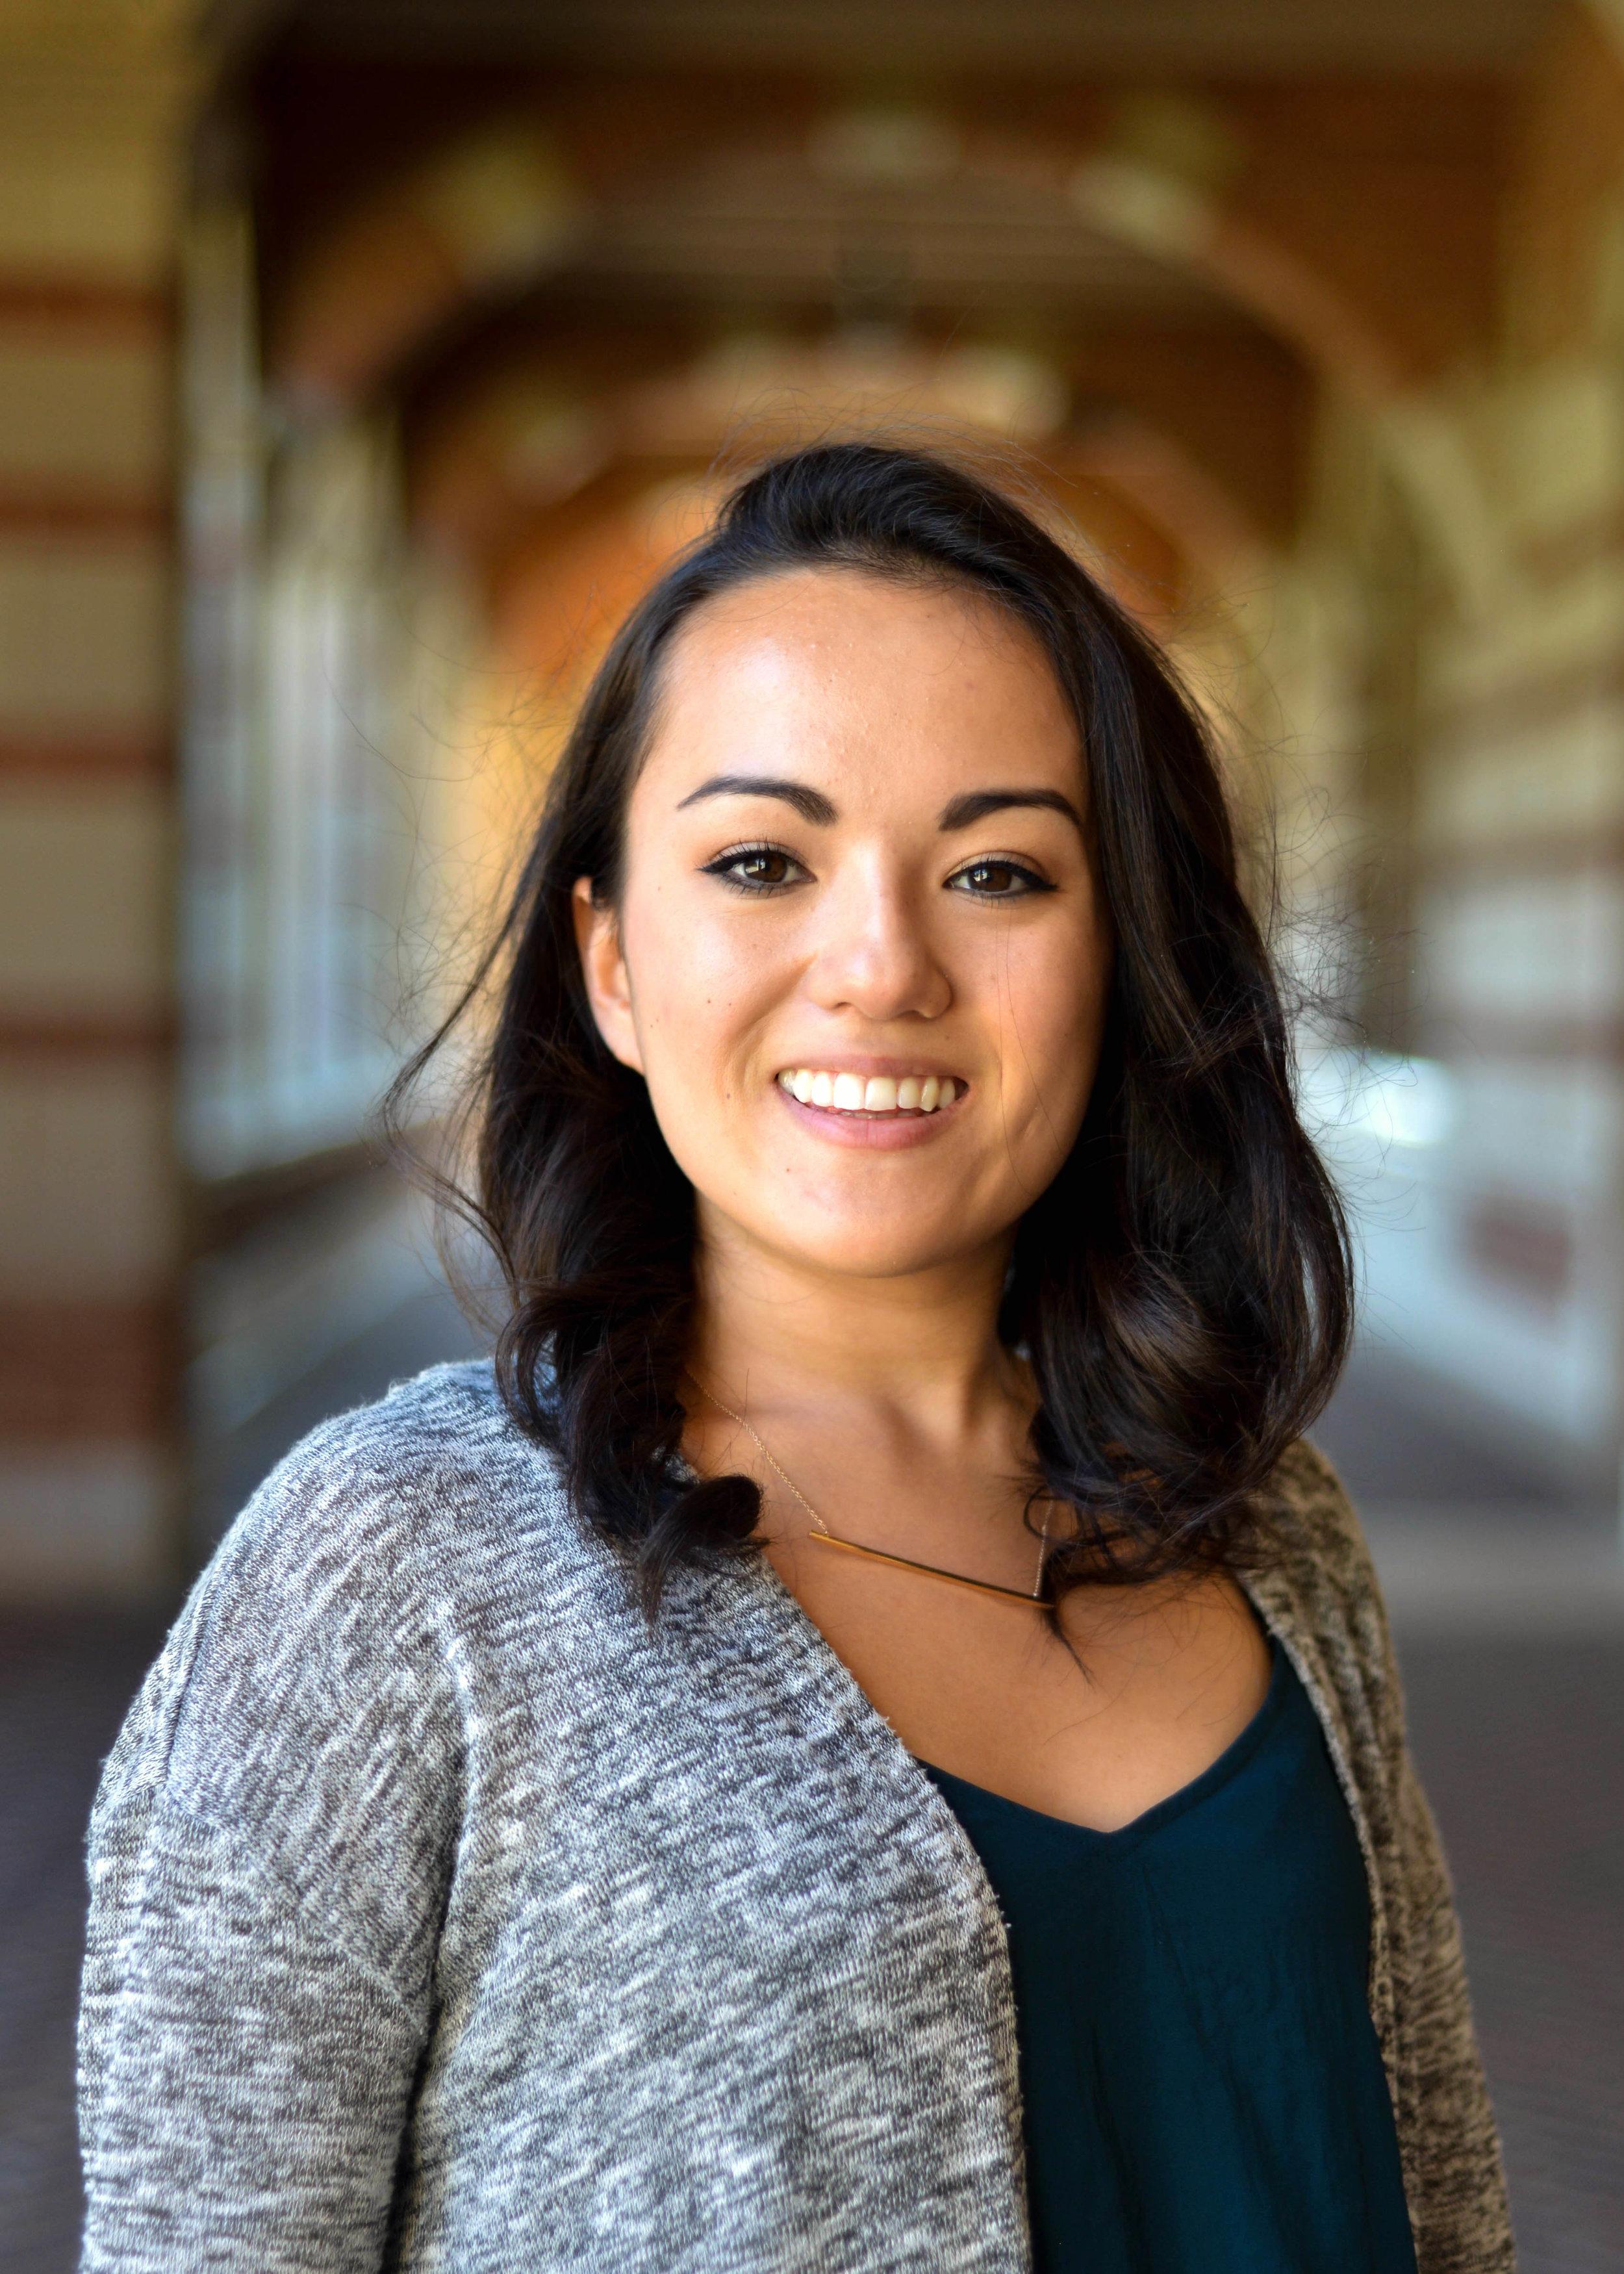 Class: Alpha Theta  Grad Year: 2018  Interests: Cooking, baking, movies  Big: Deanna Pe  Little: Hutchison Chin   LinkedIn